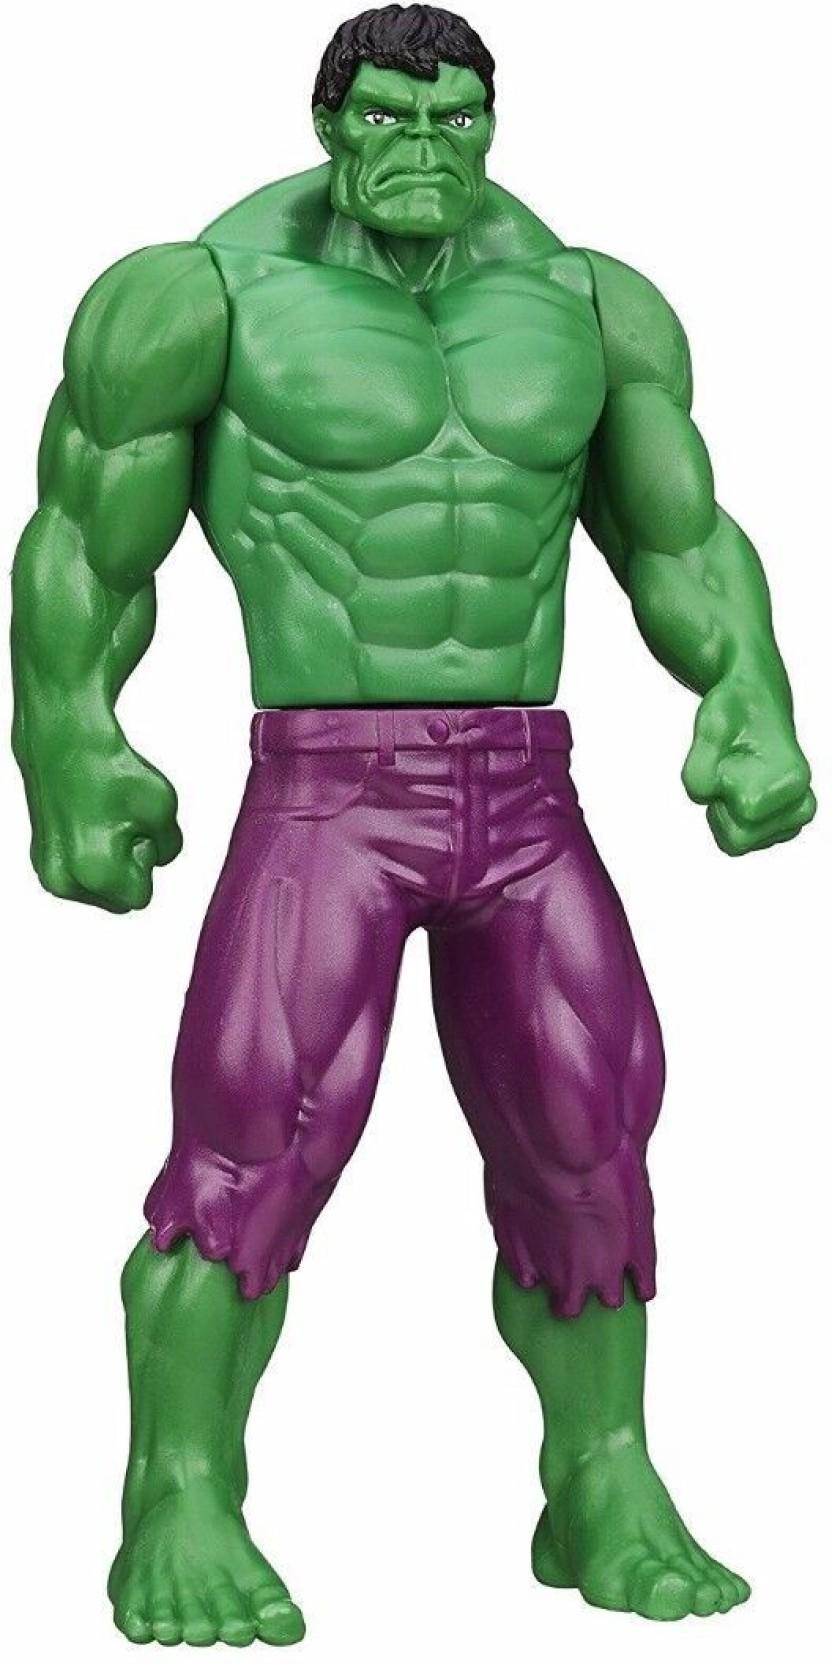 Hasbro Marvel Hulk. ADD TO CART